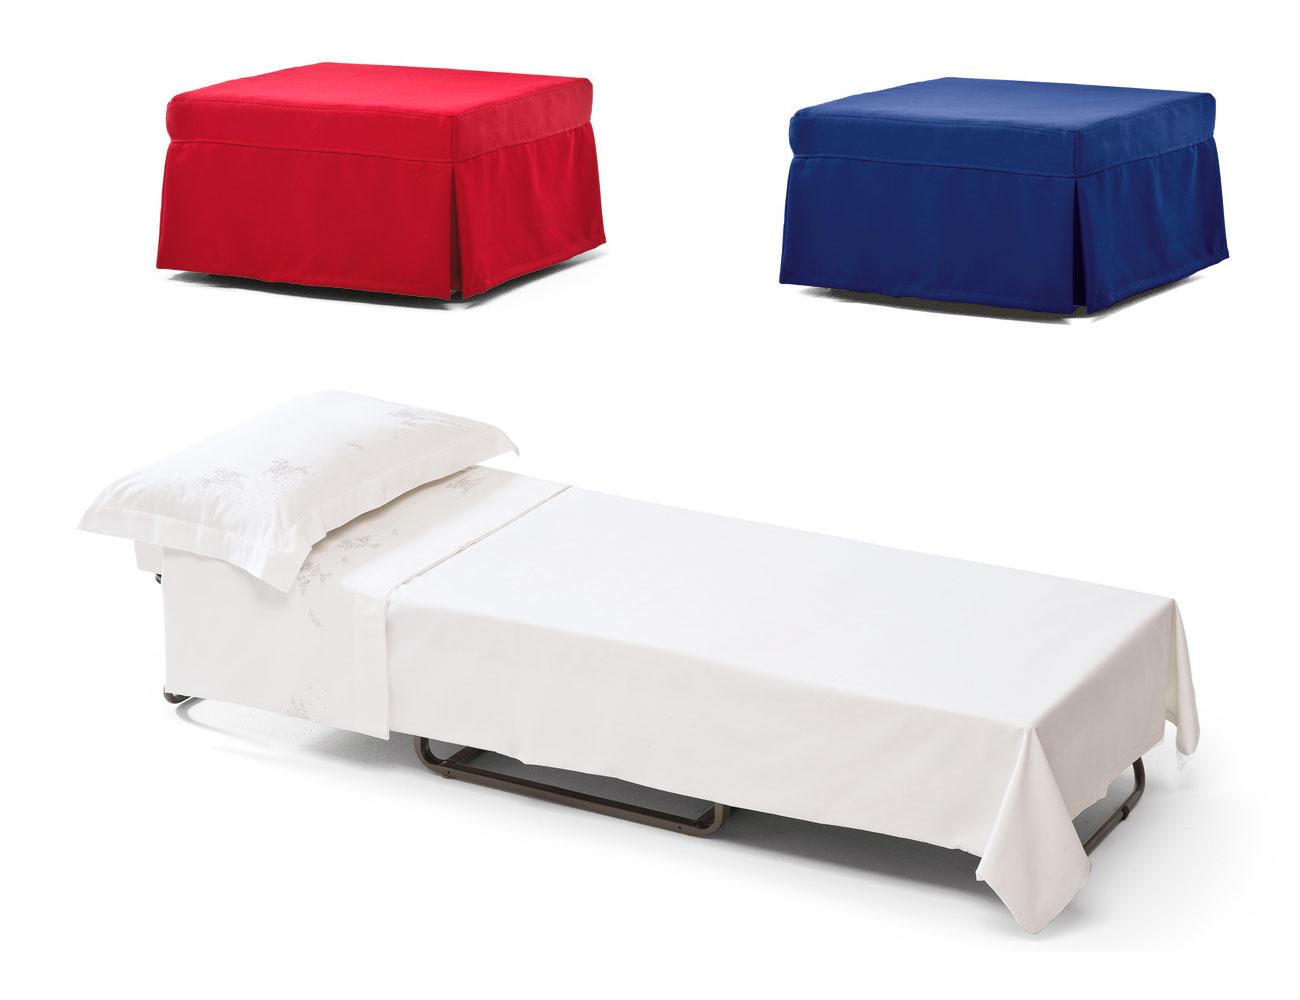 Sofa cama convertible puf1